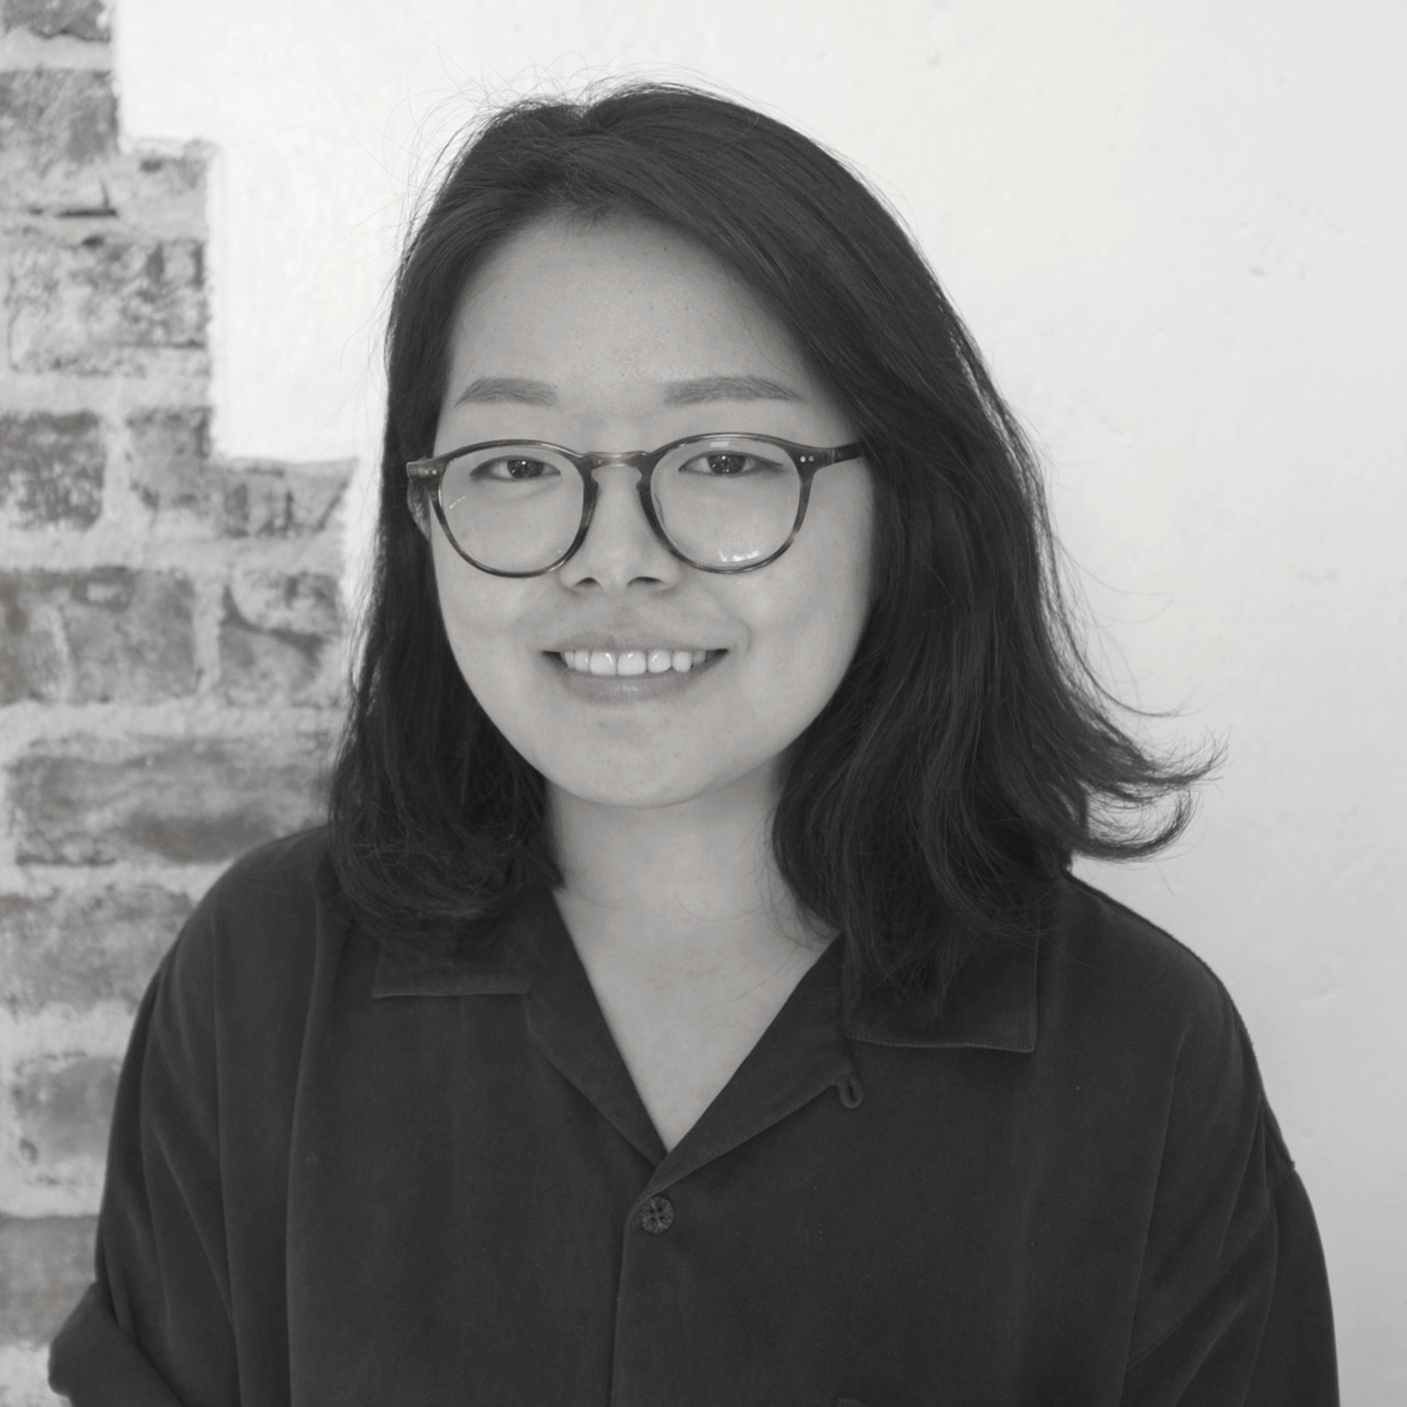 Esther Park, Graphic Design Director